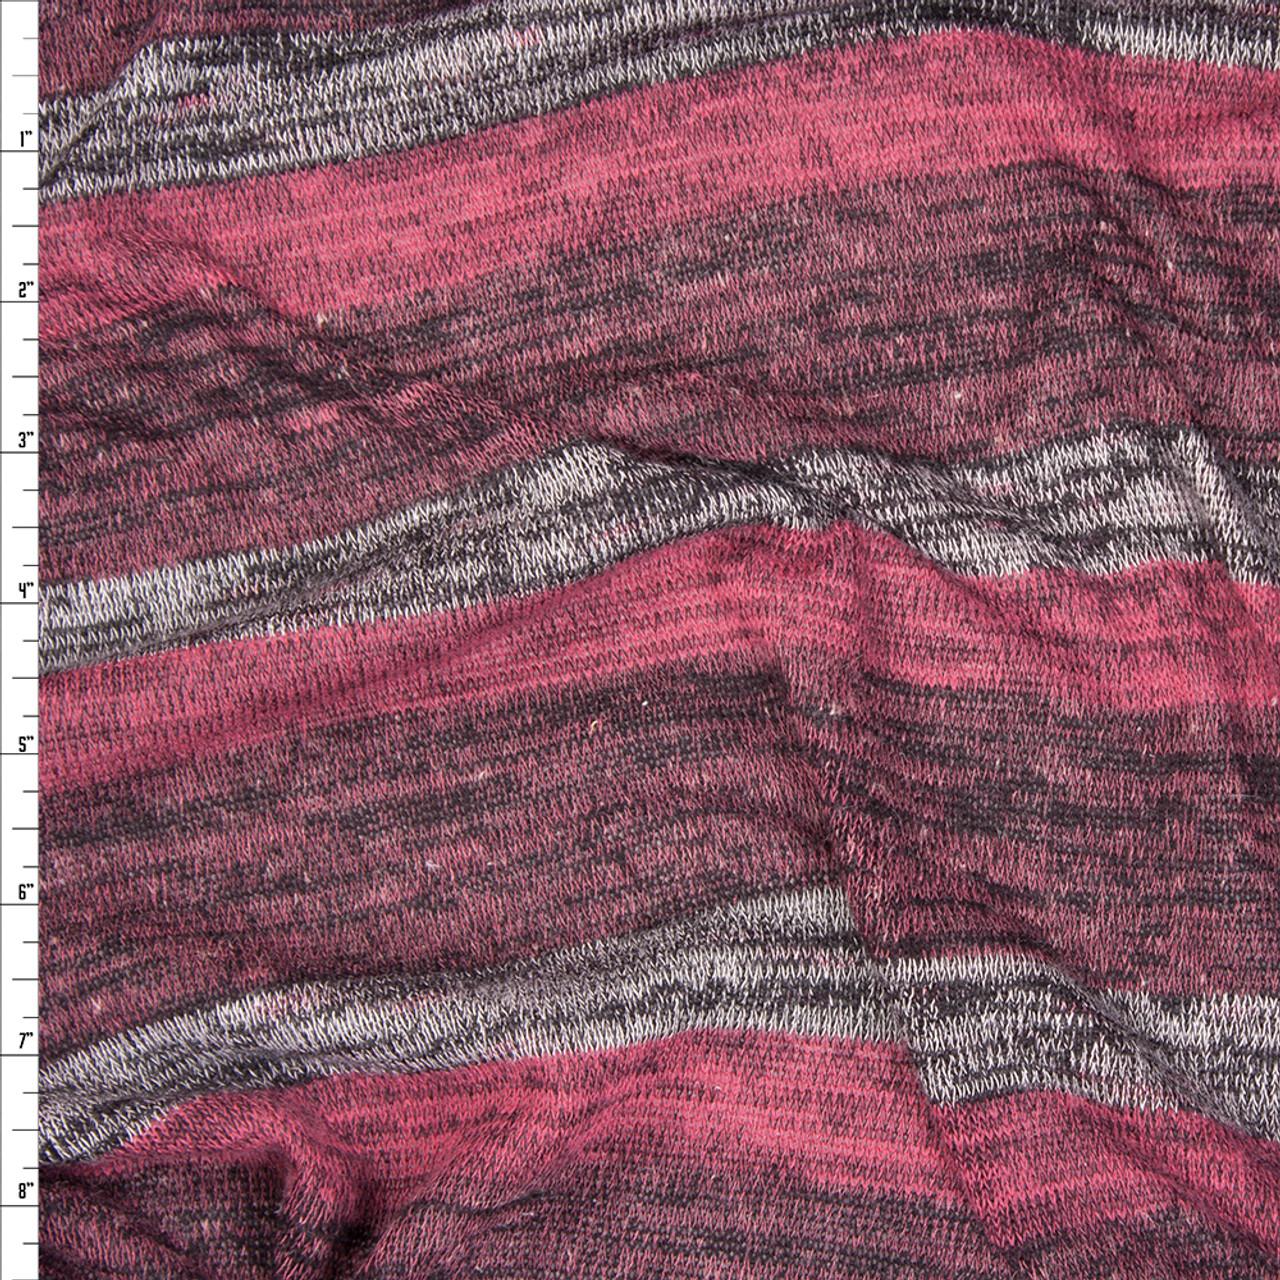 6e773c9fc48 Plum, Fuchsia, and Grey Heather Stripe Lightweight Sweater Knit ...